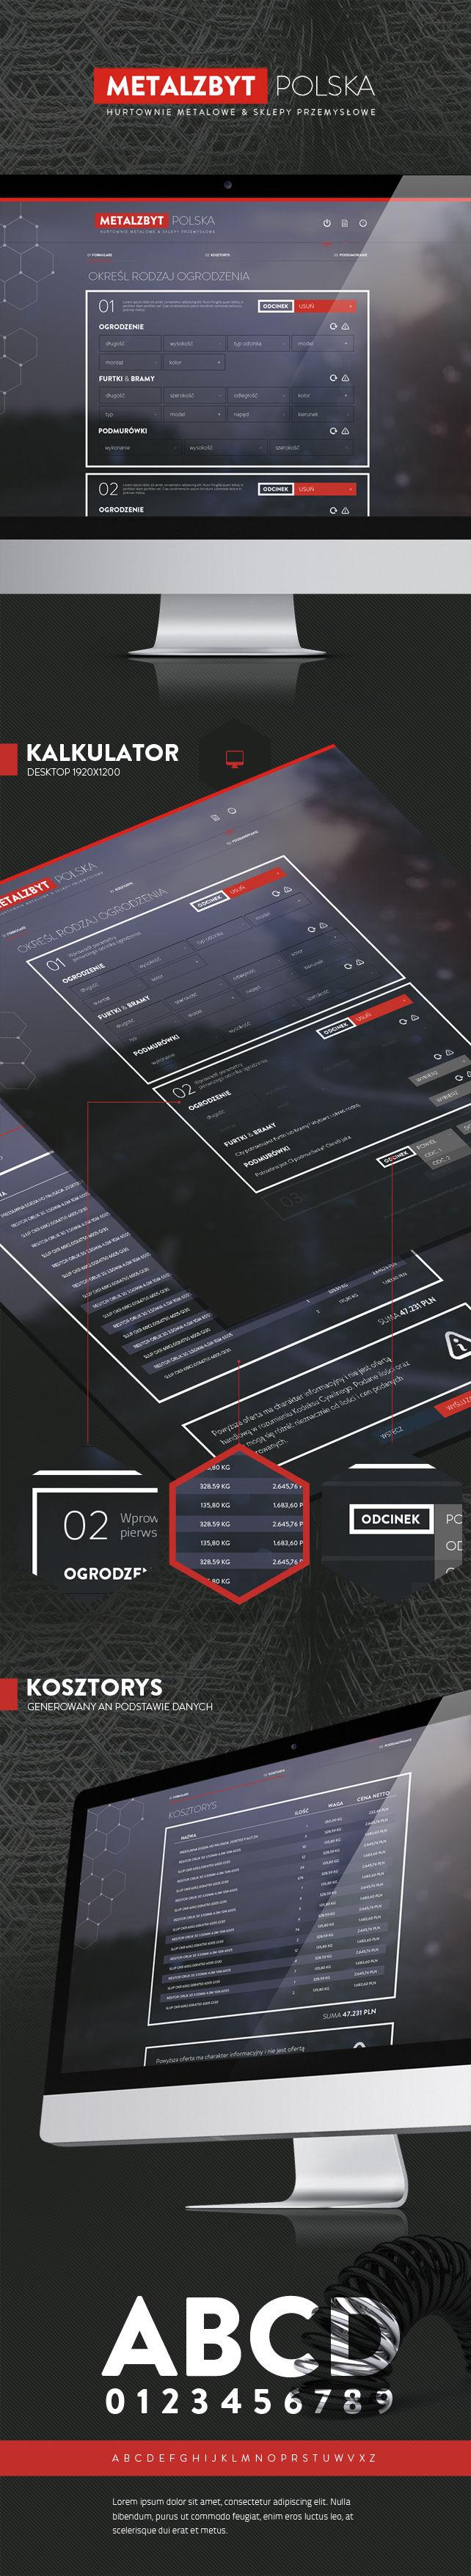 Projekt graficzny, konfiguratory Metalzbyt Kalkulator bram i ogrodzeń